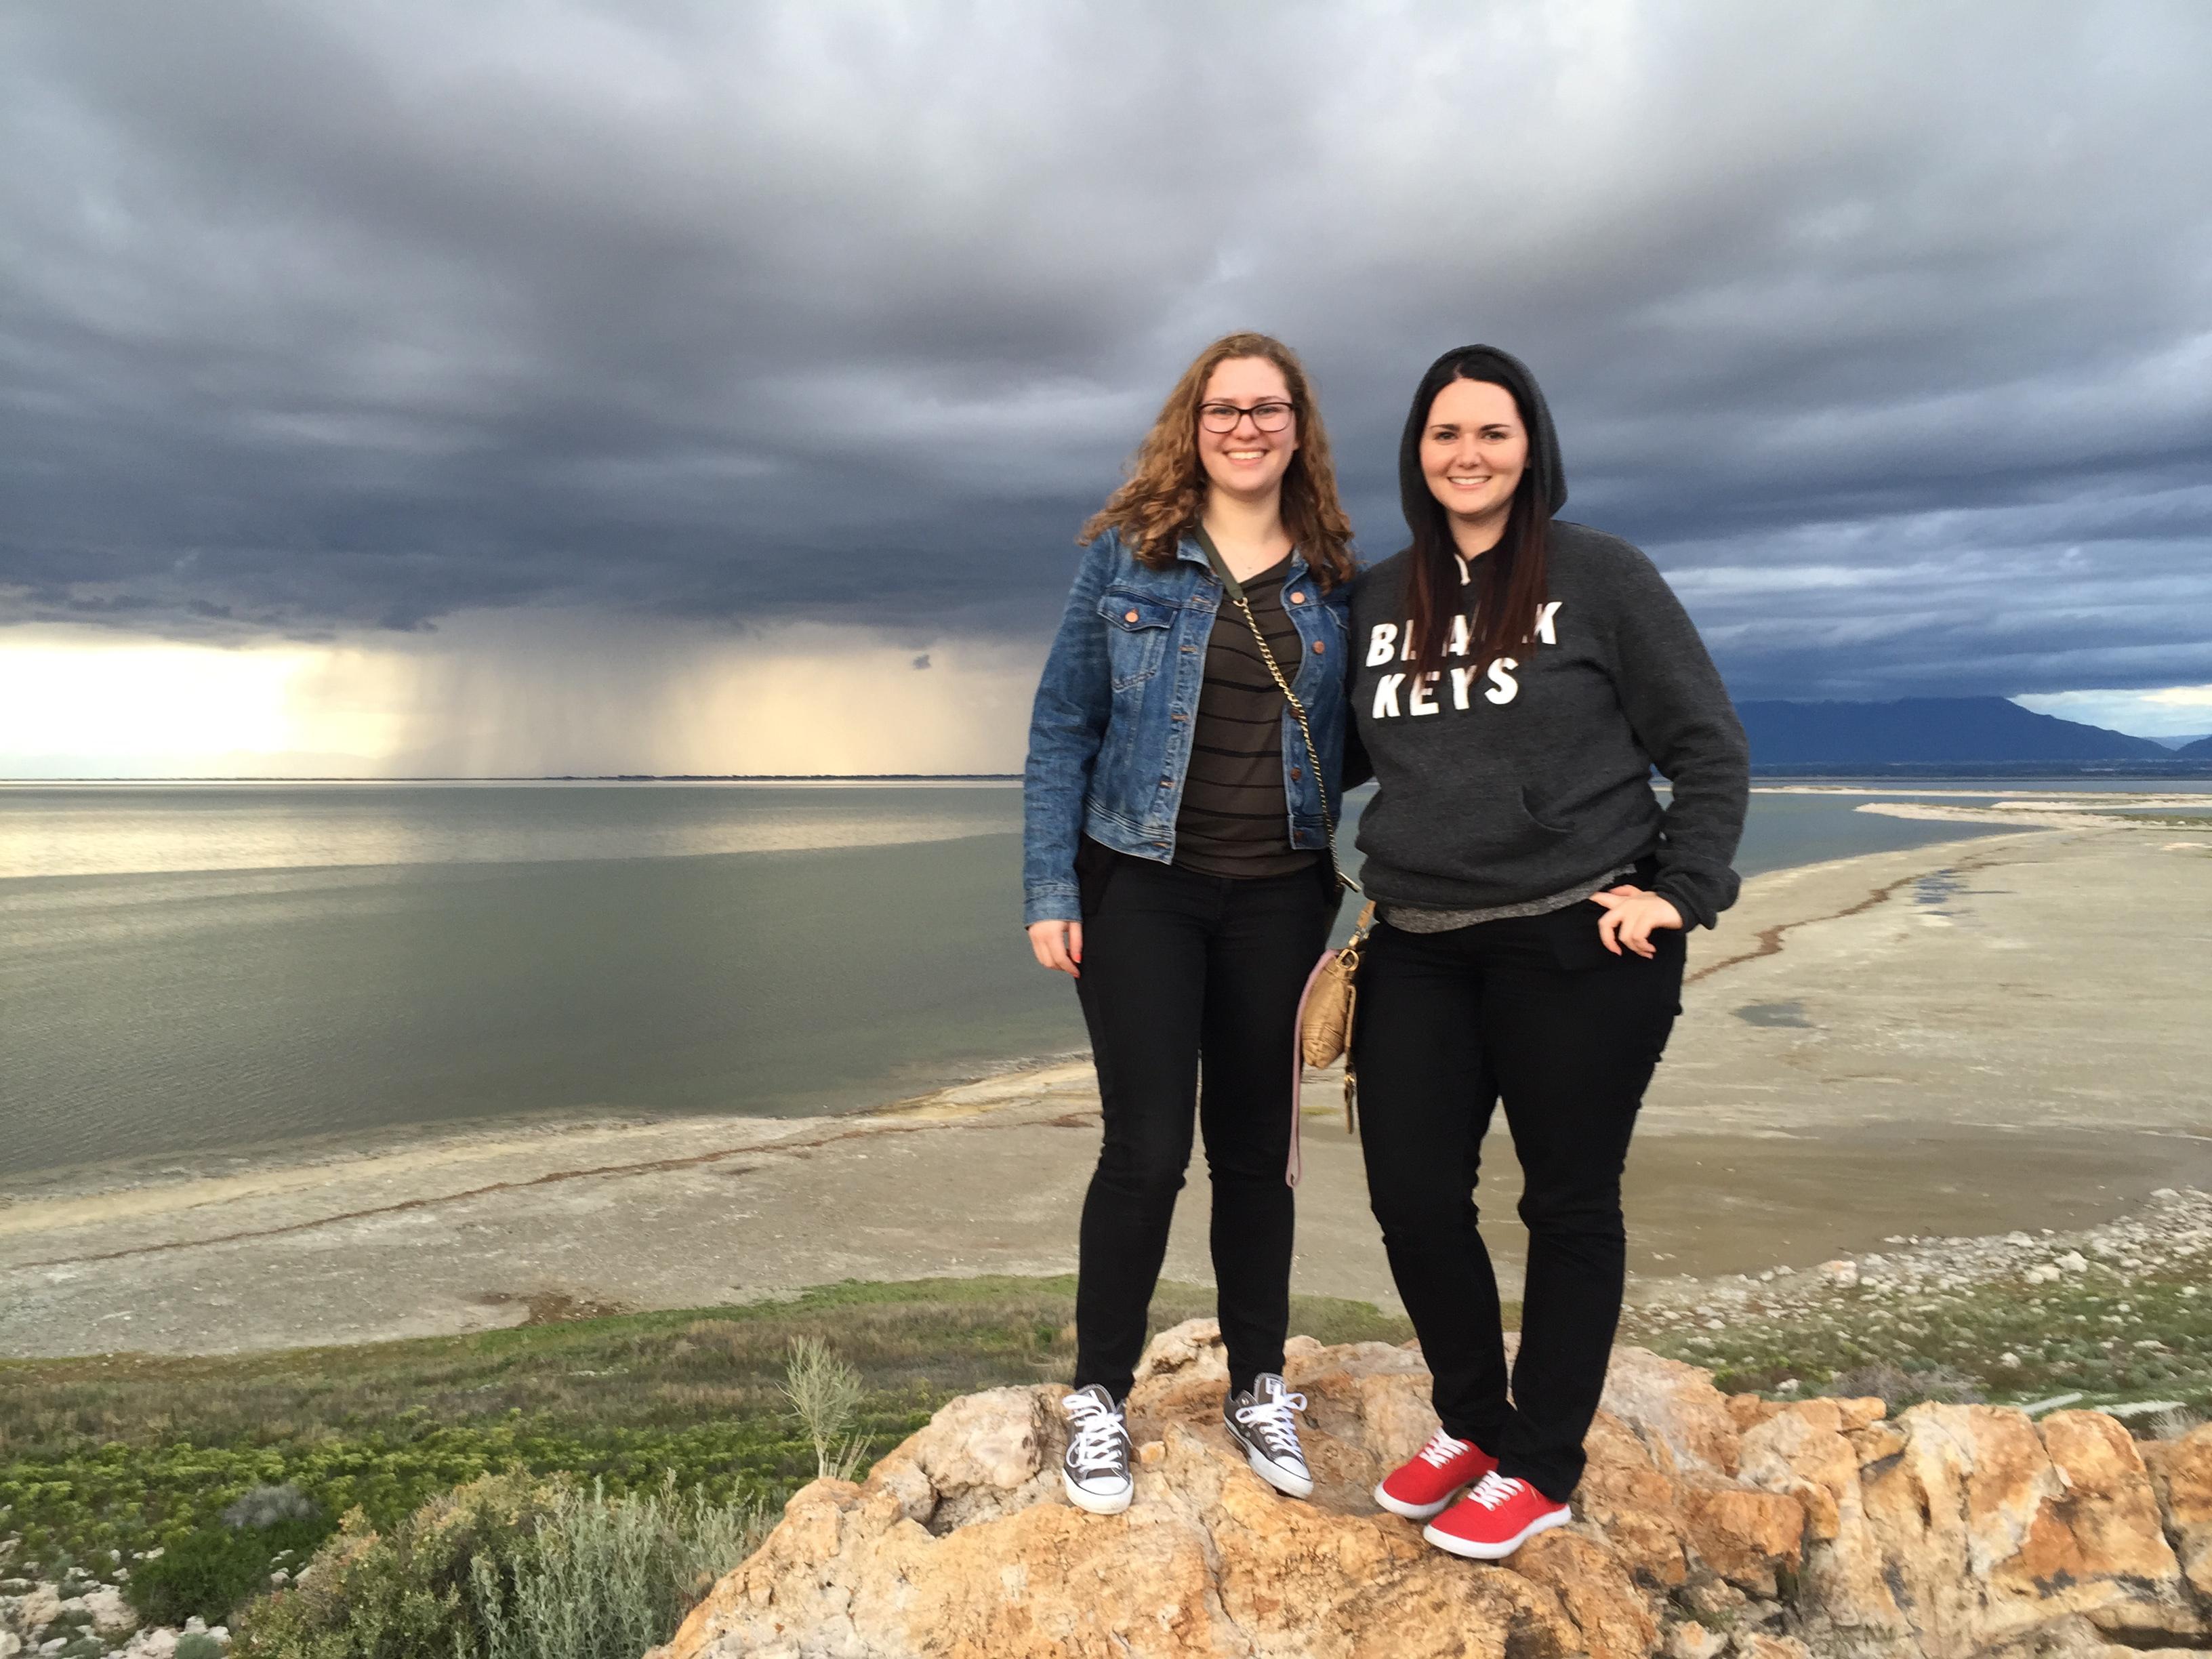 Masha and Molly take Salt Lake May 24, 2015 956